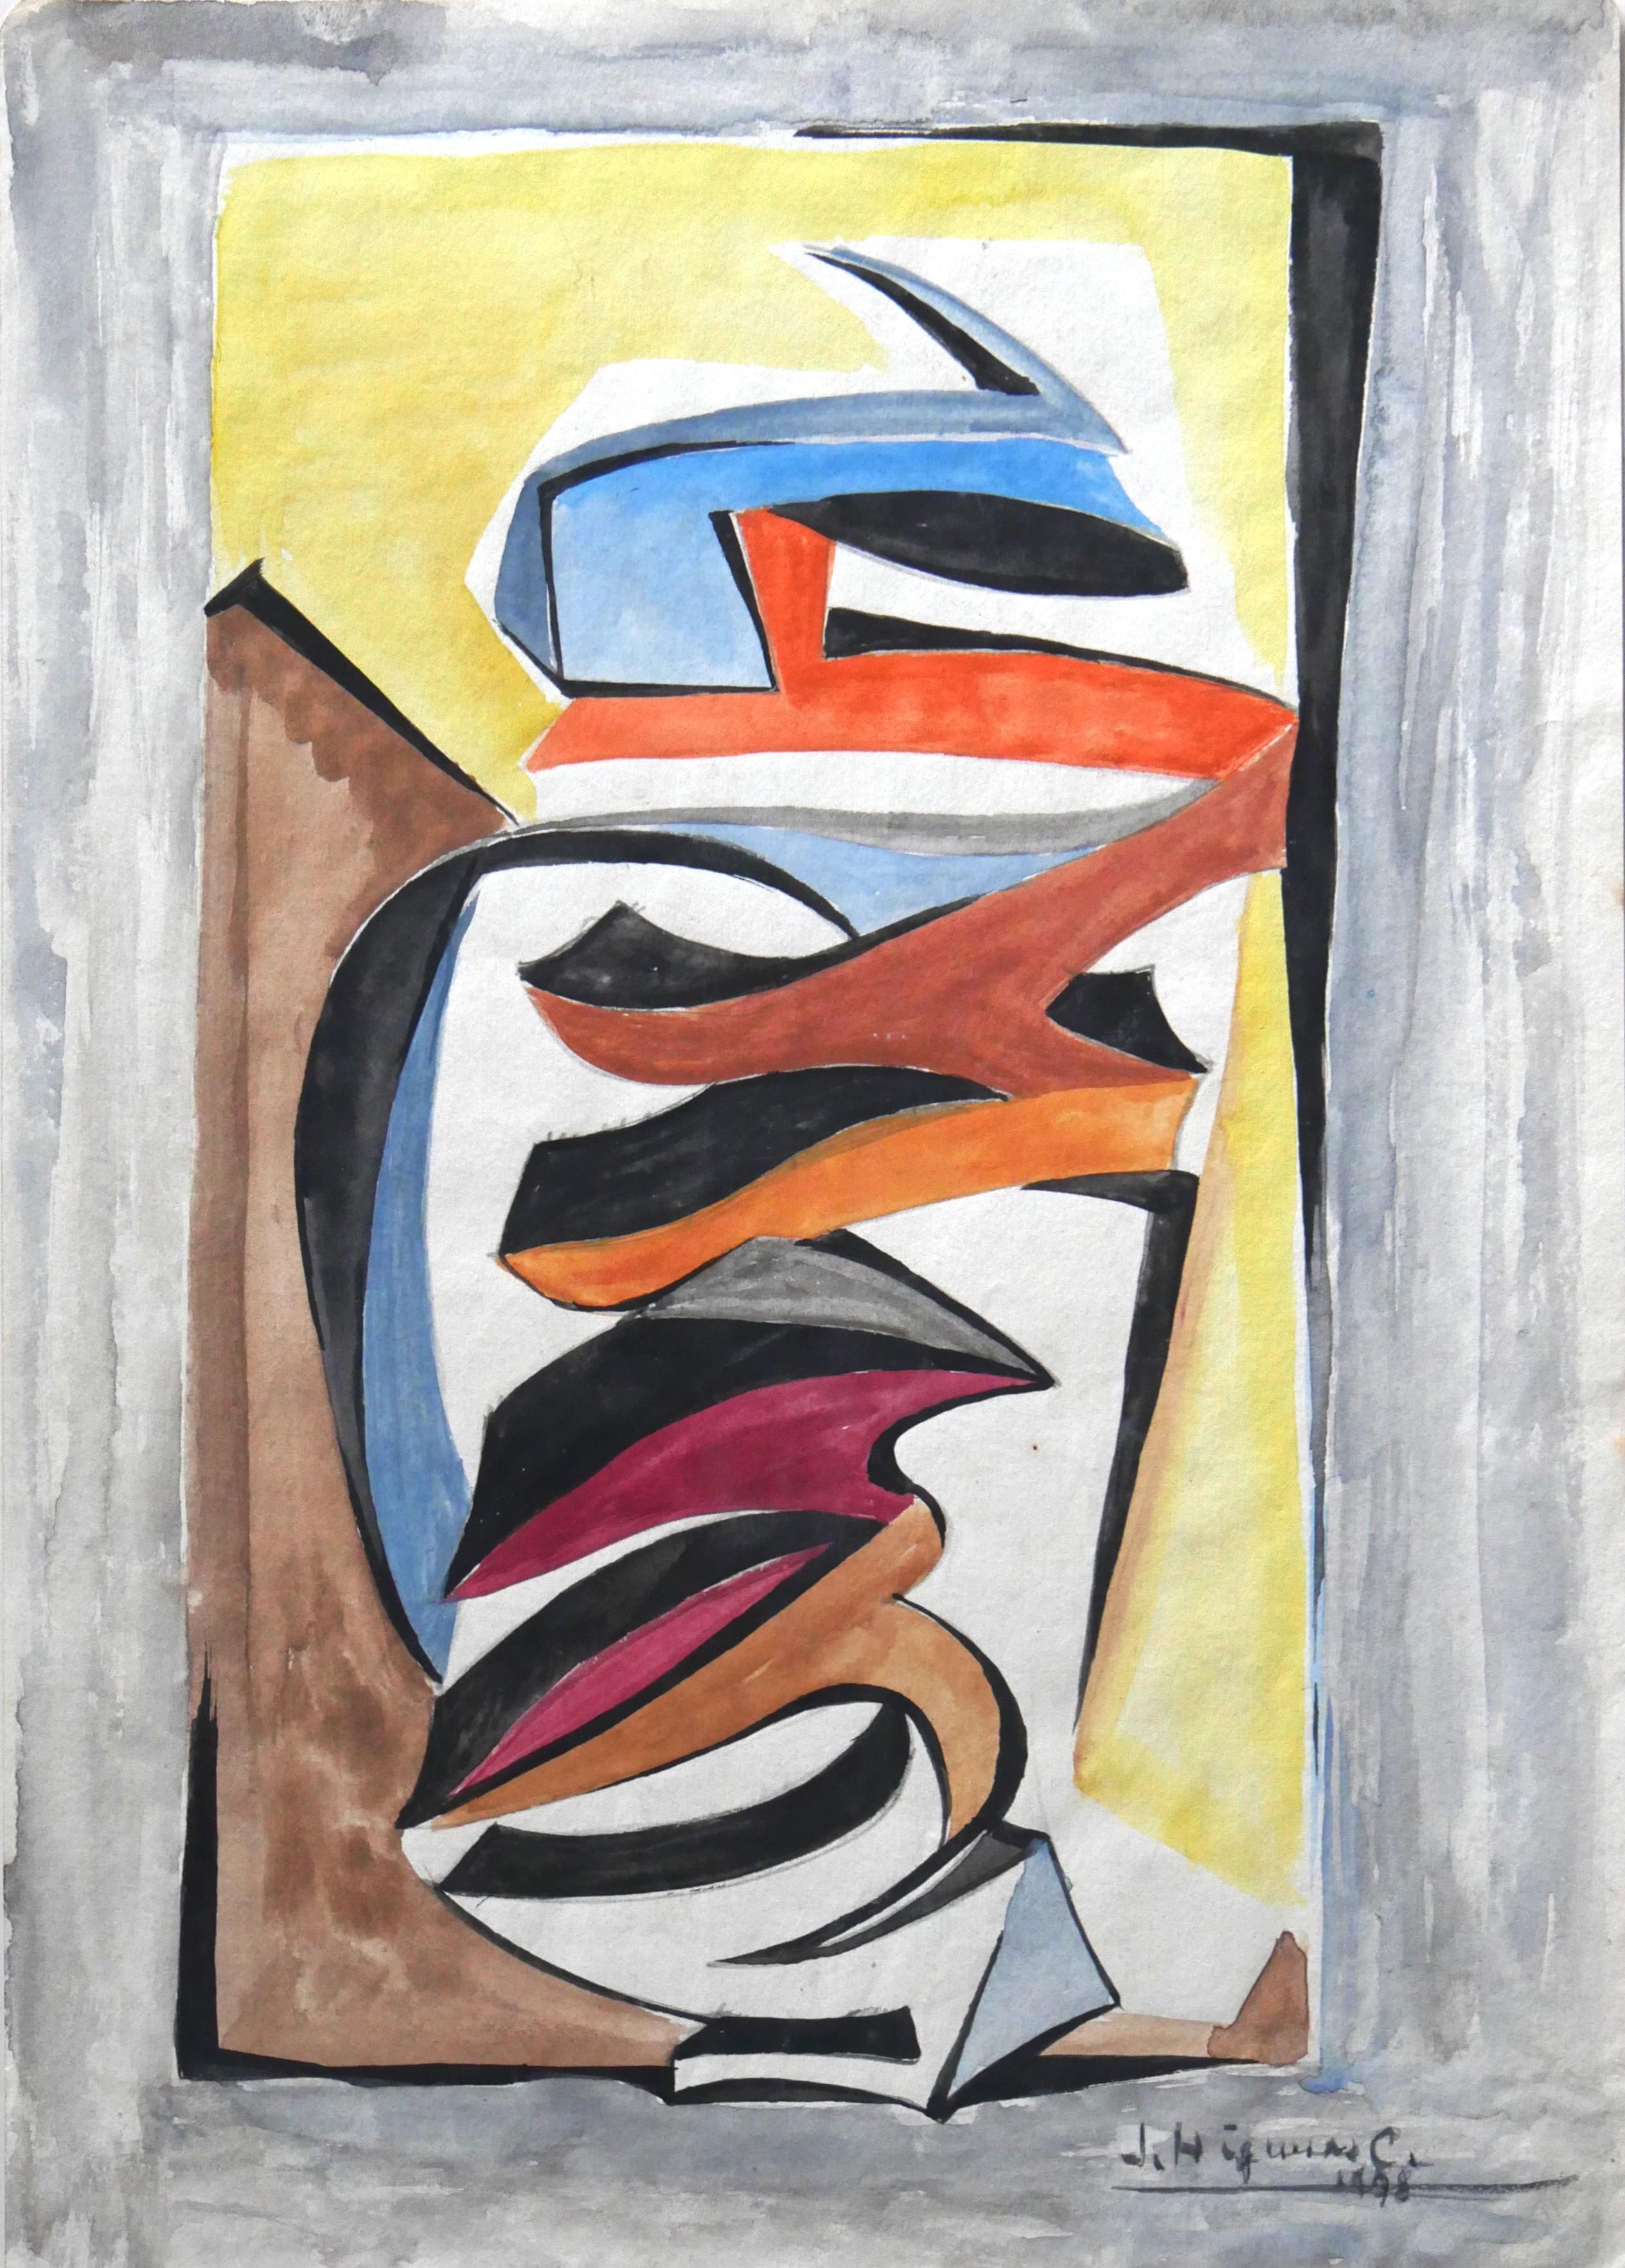 1978. Forma abstracta.32x22,5 cms. Acuarela en varios colores sobre papel.